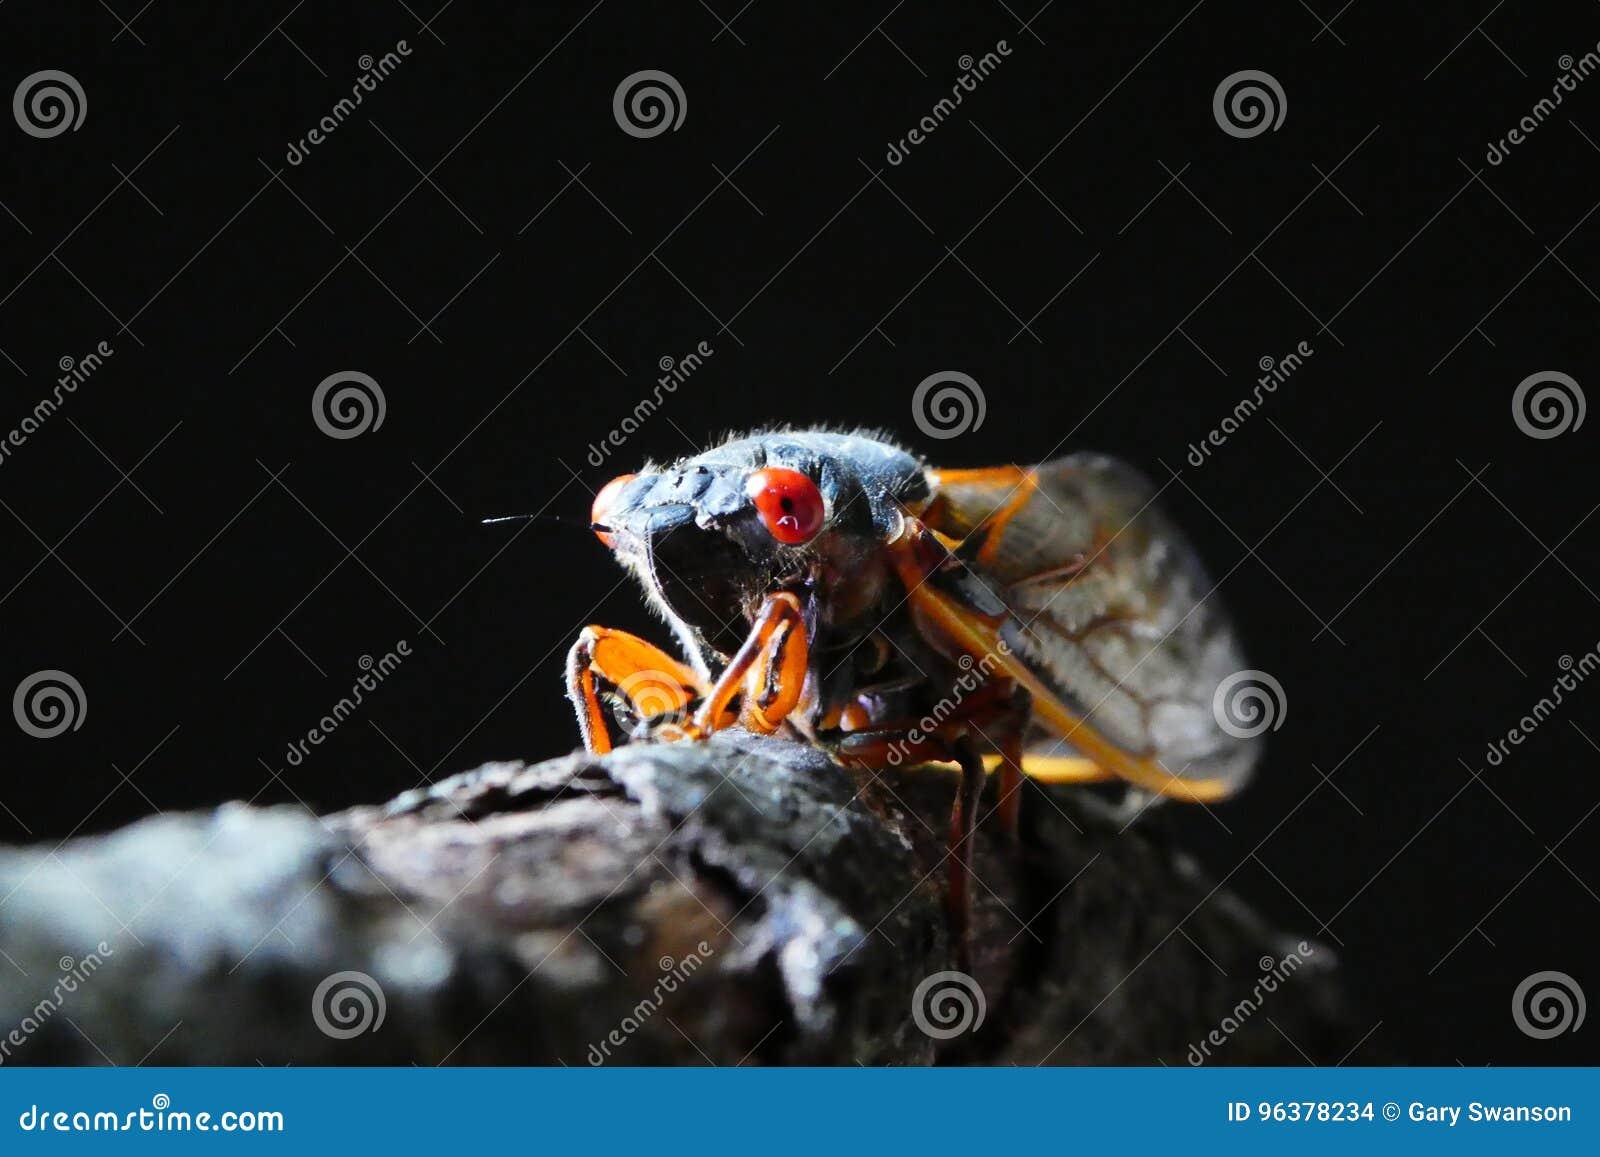 Cicada on branch